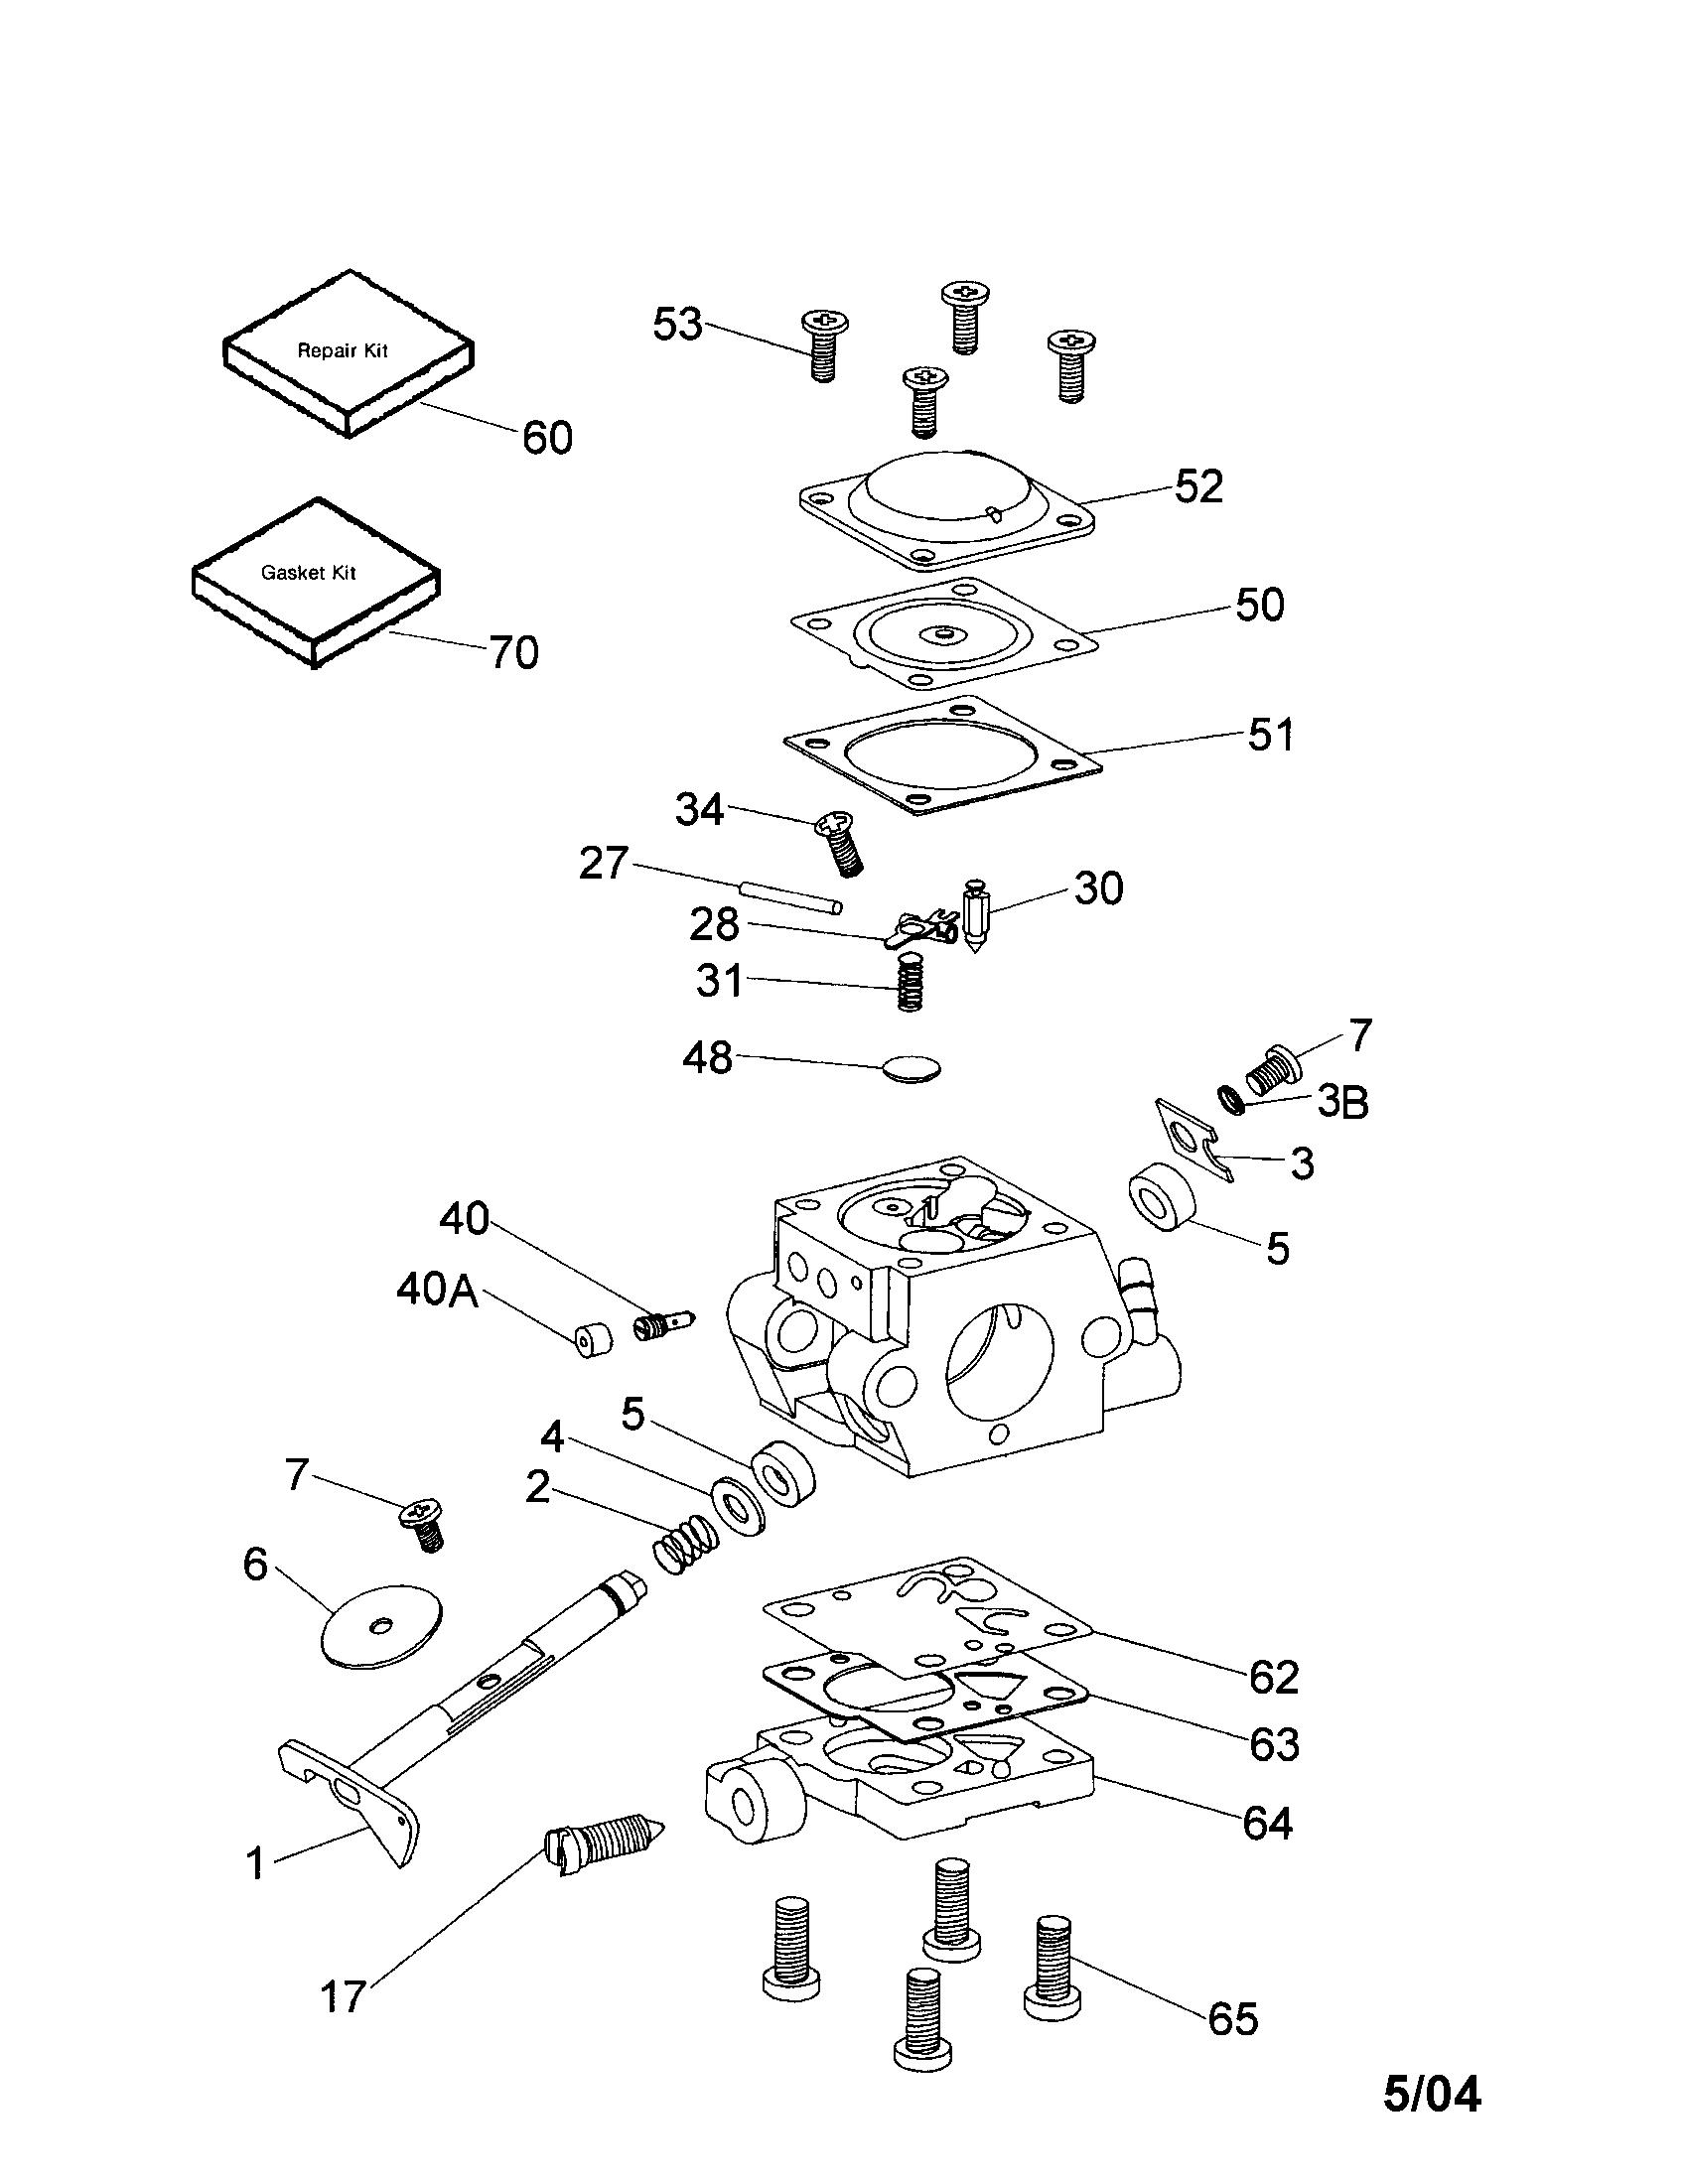 tractor accessories 640347 carburetor diagram [ 1696 x 2200 Pixel ]